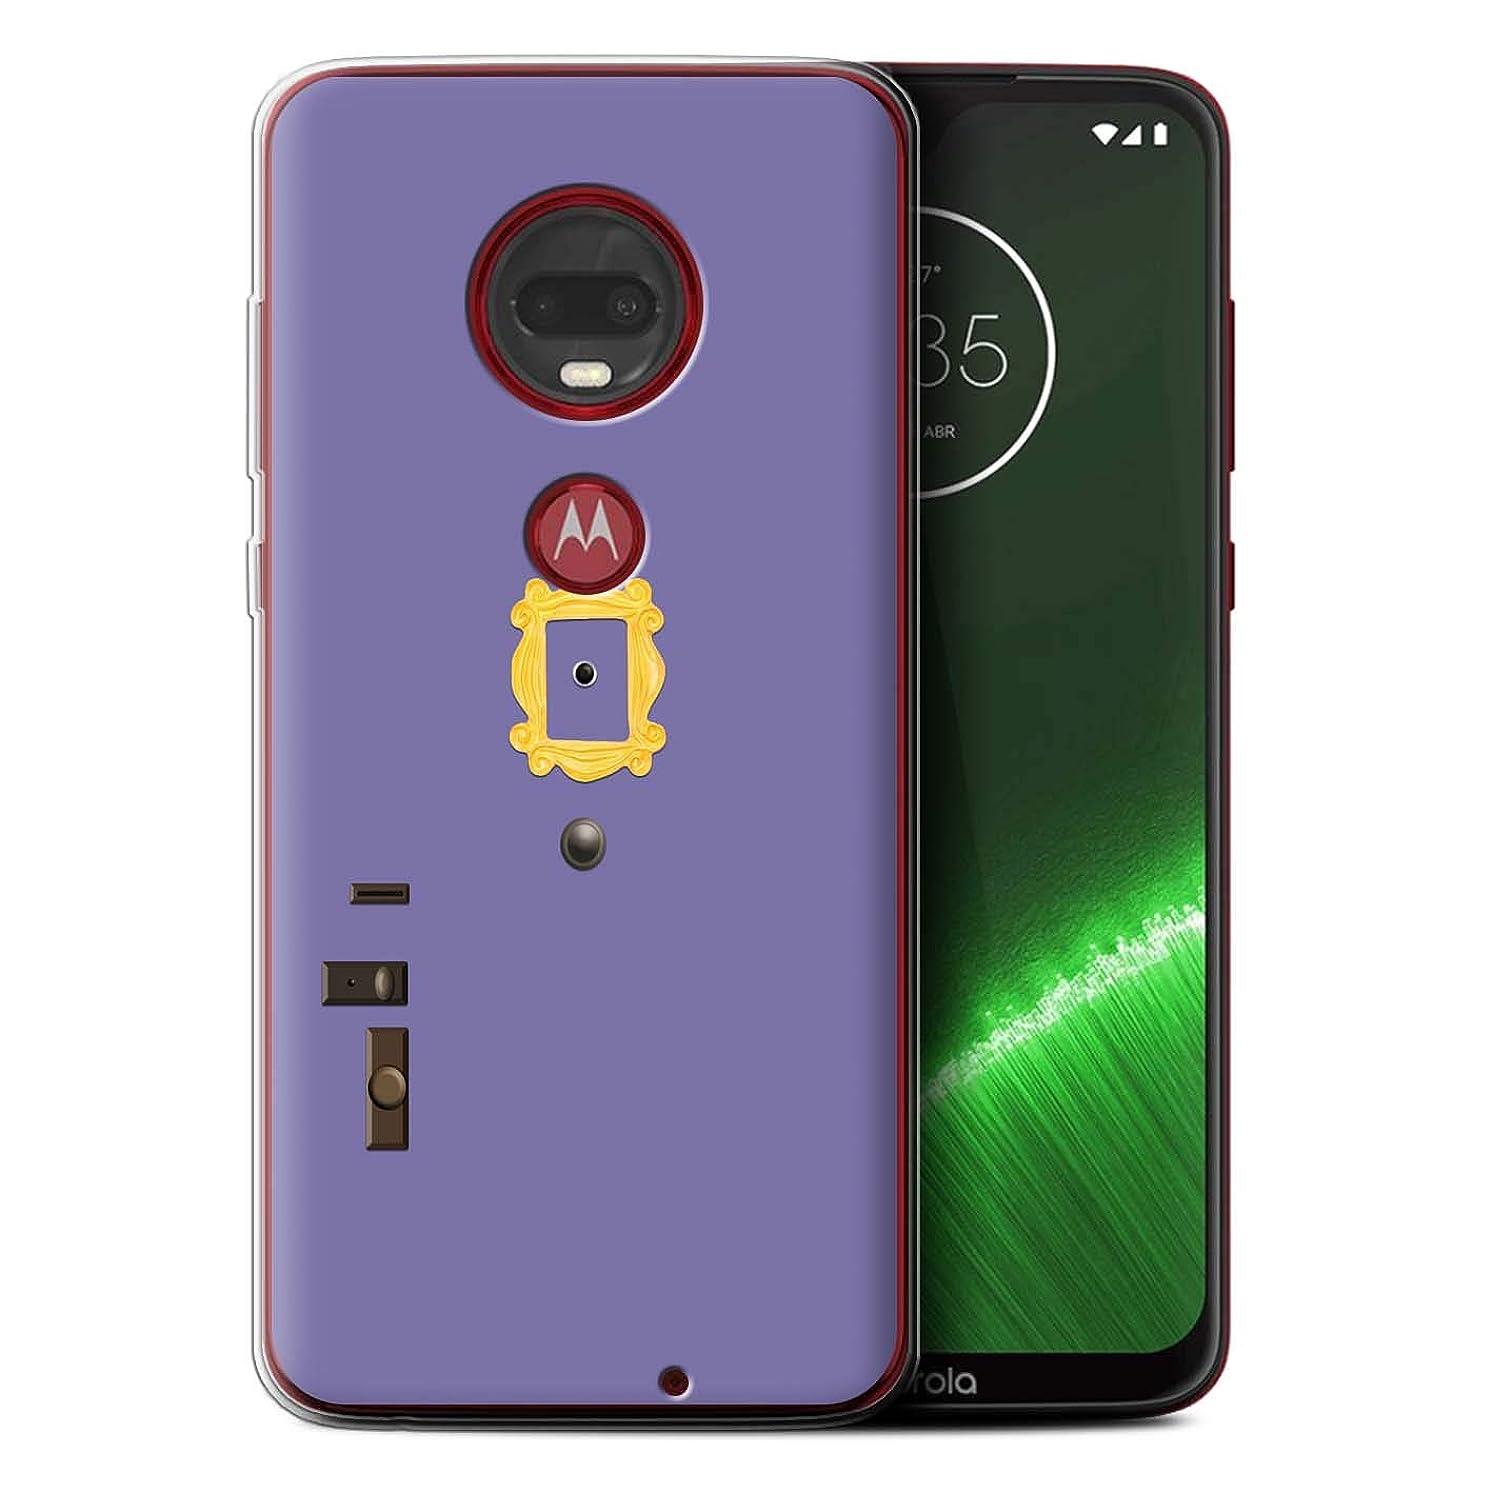 eSwish Gel TPU Phone Case/Cover for Motorola Moto G7/G7 Plus/Monica's Purple Door Design/Funny Sitcom TV Parody Collection